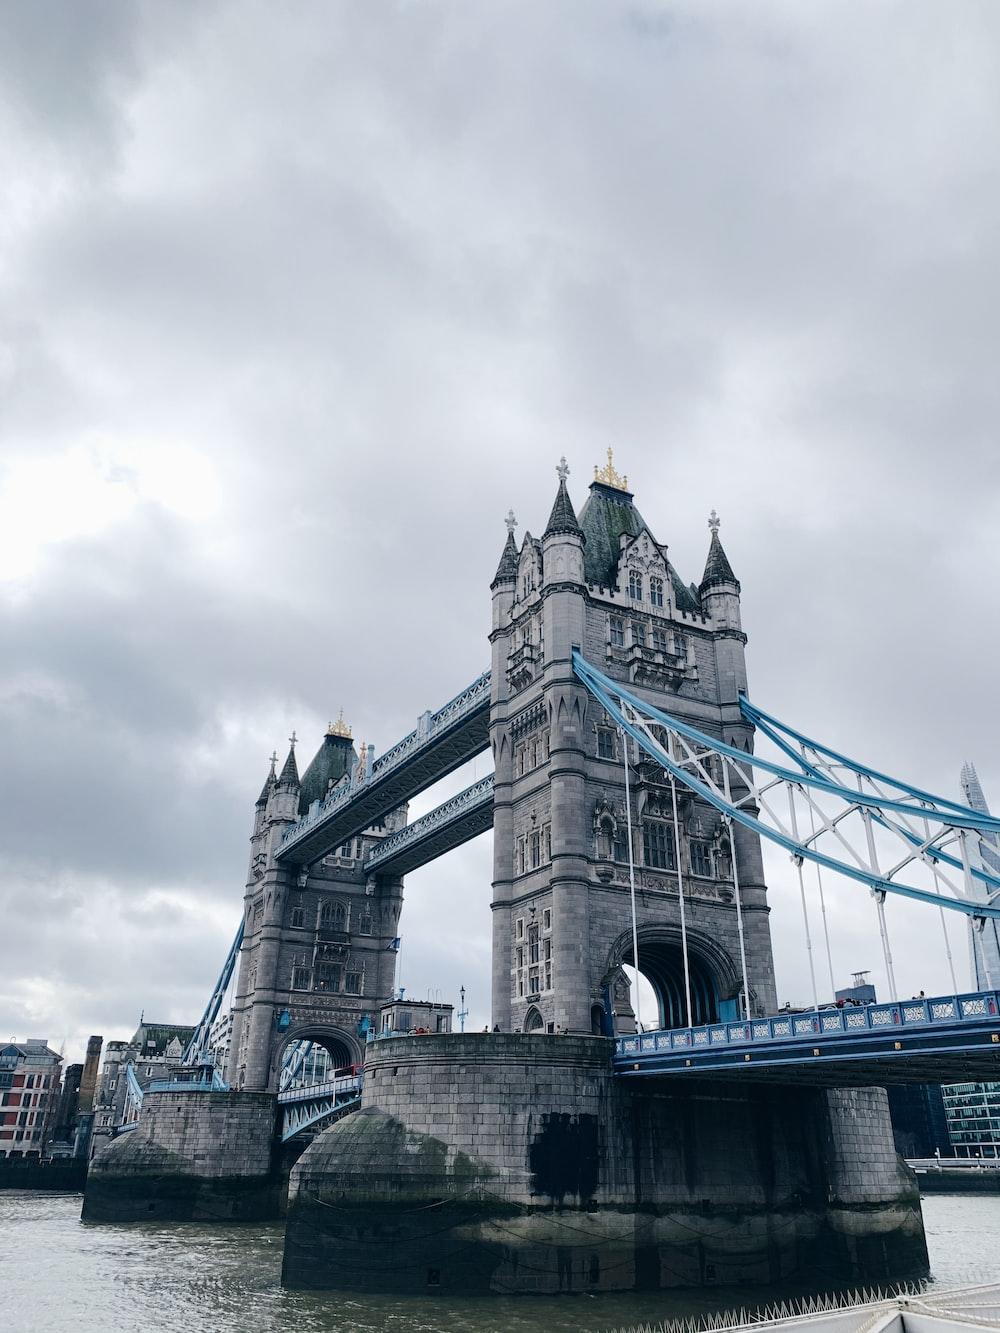 gray concrete bridge under cloudy sky during daytime